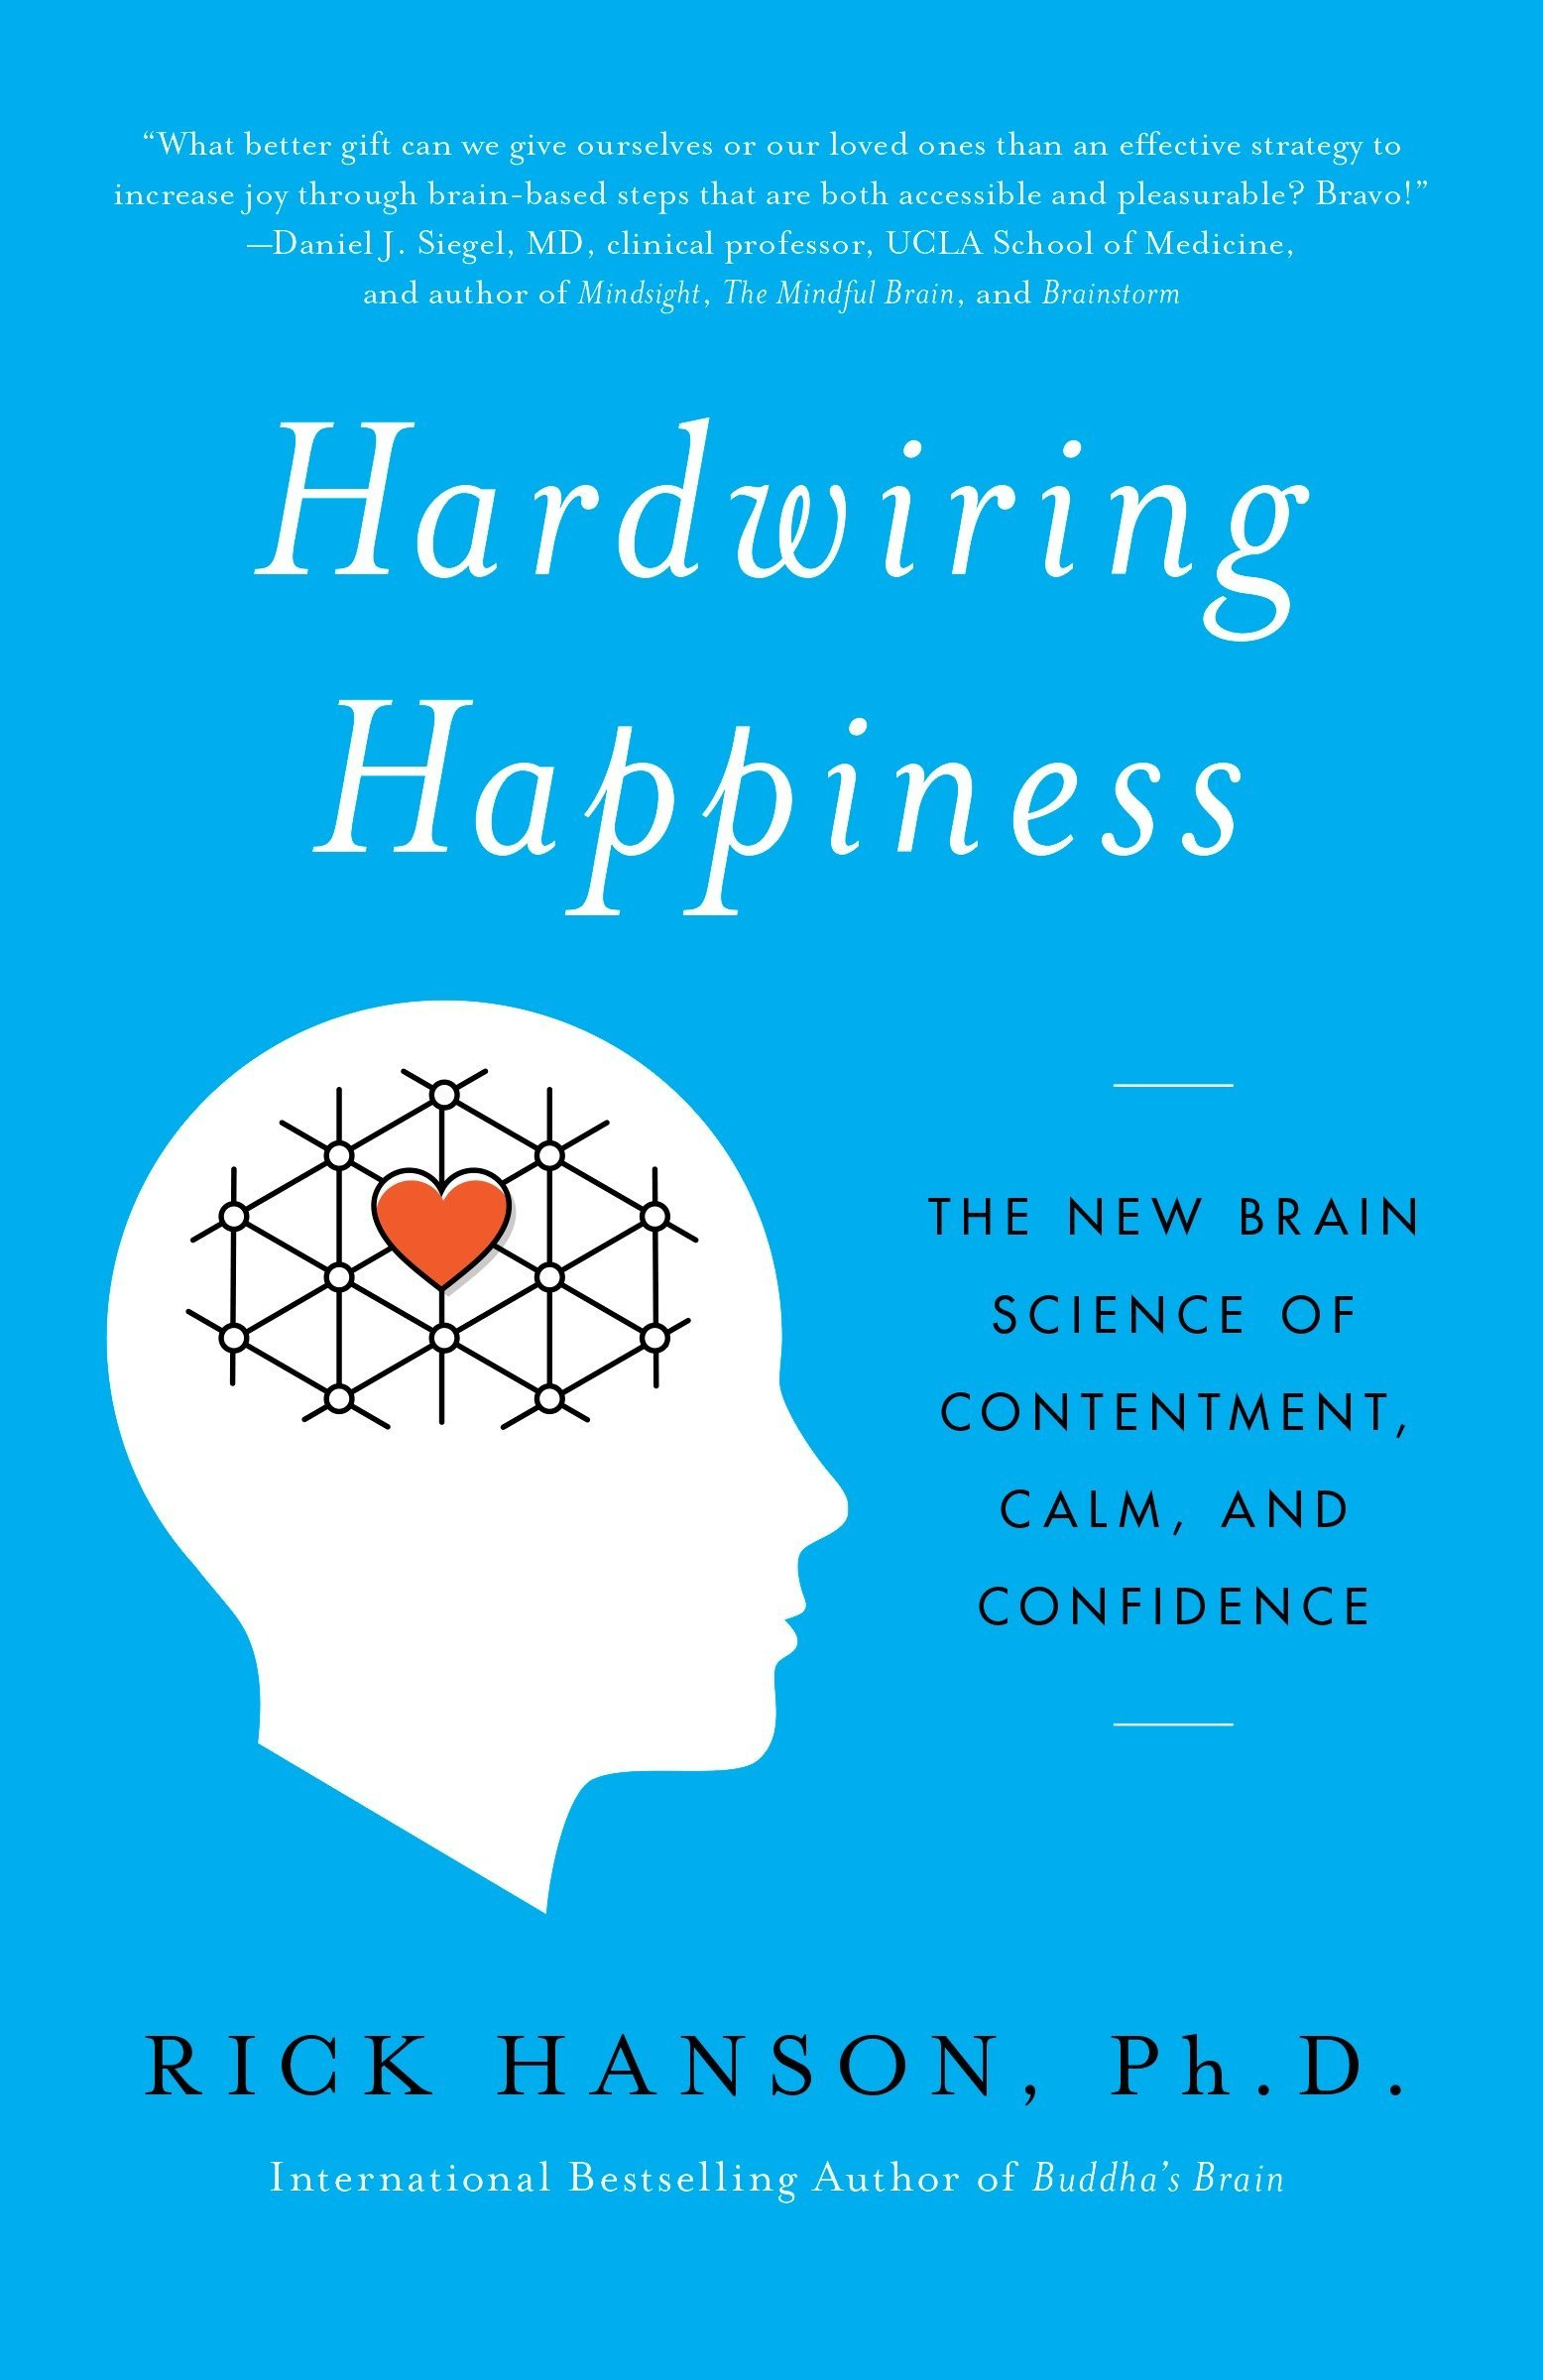 Hardwiring Happiness book by Rick Hanson